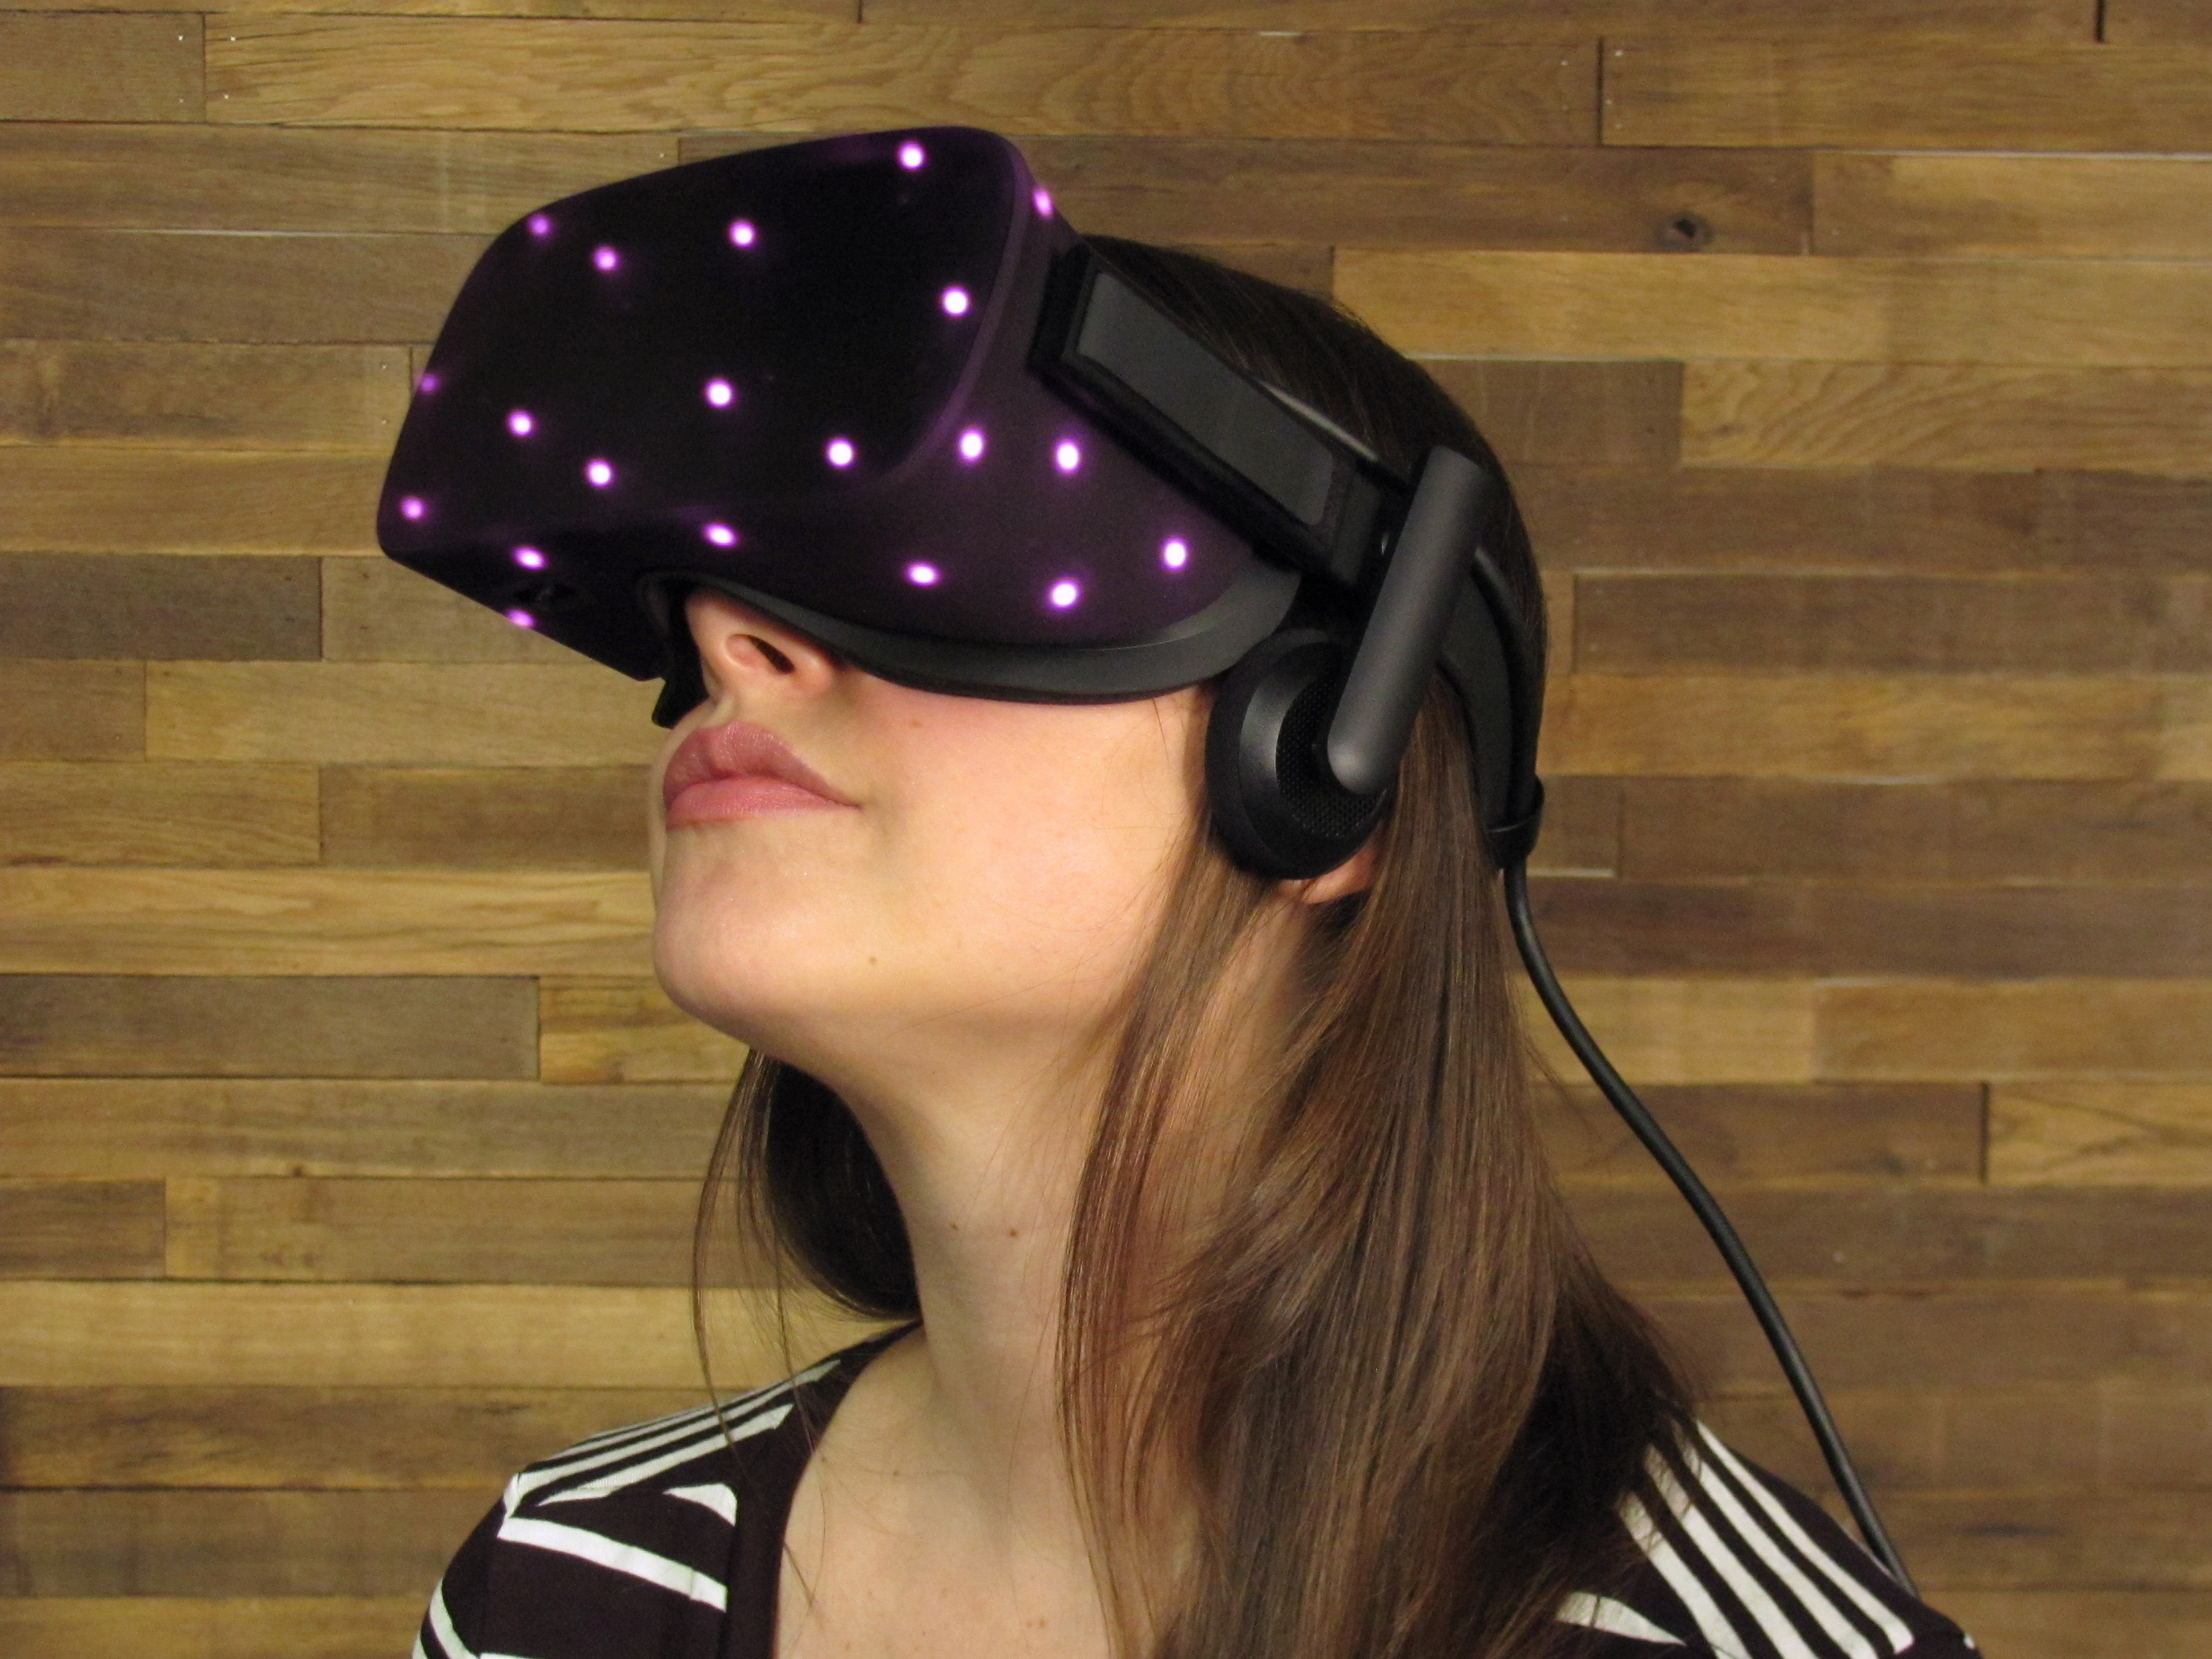 Oculus Rift IR tracking